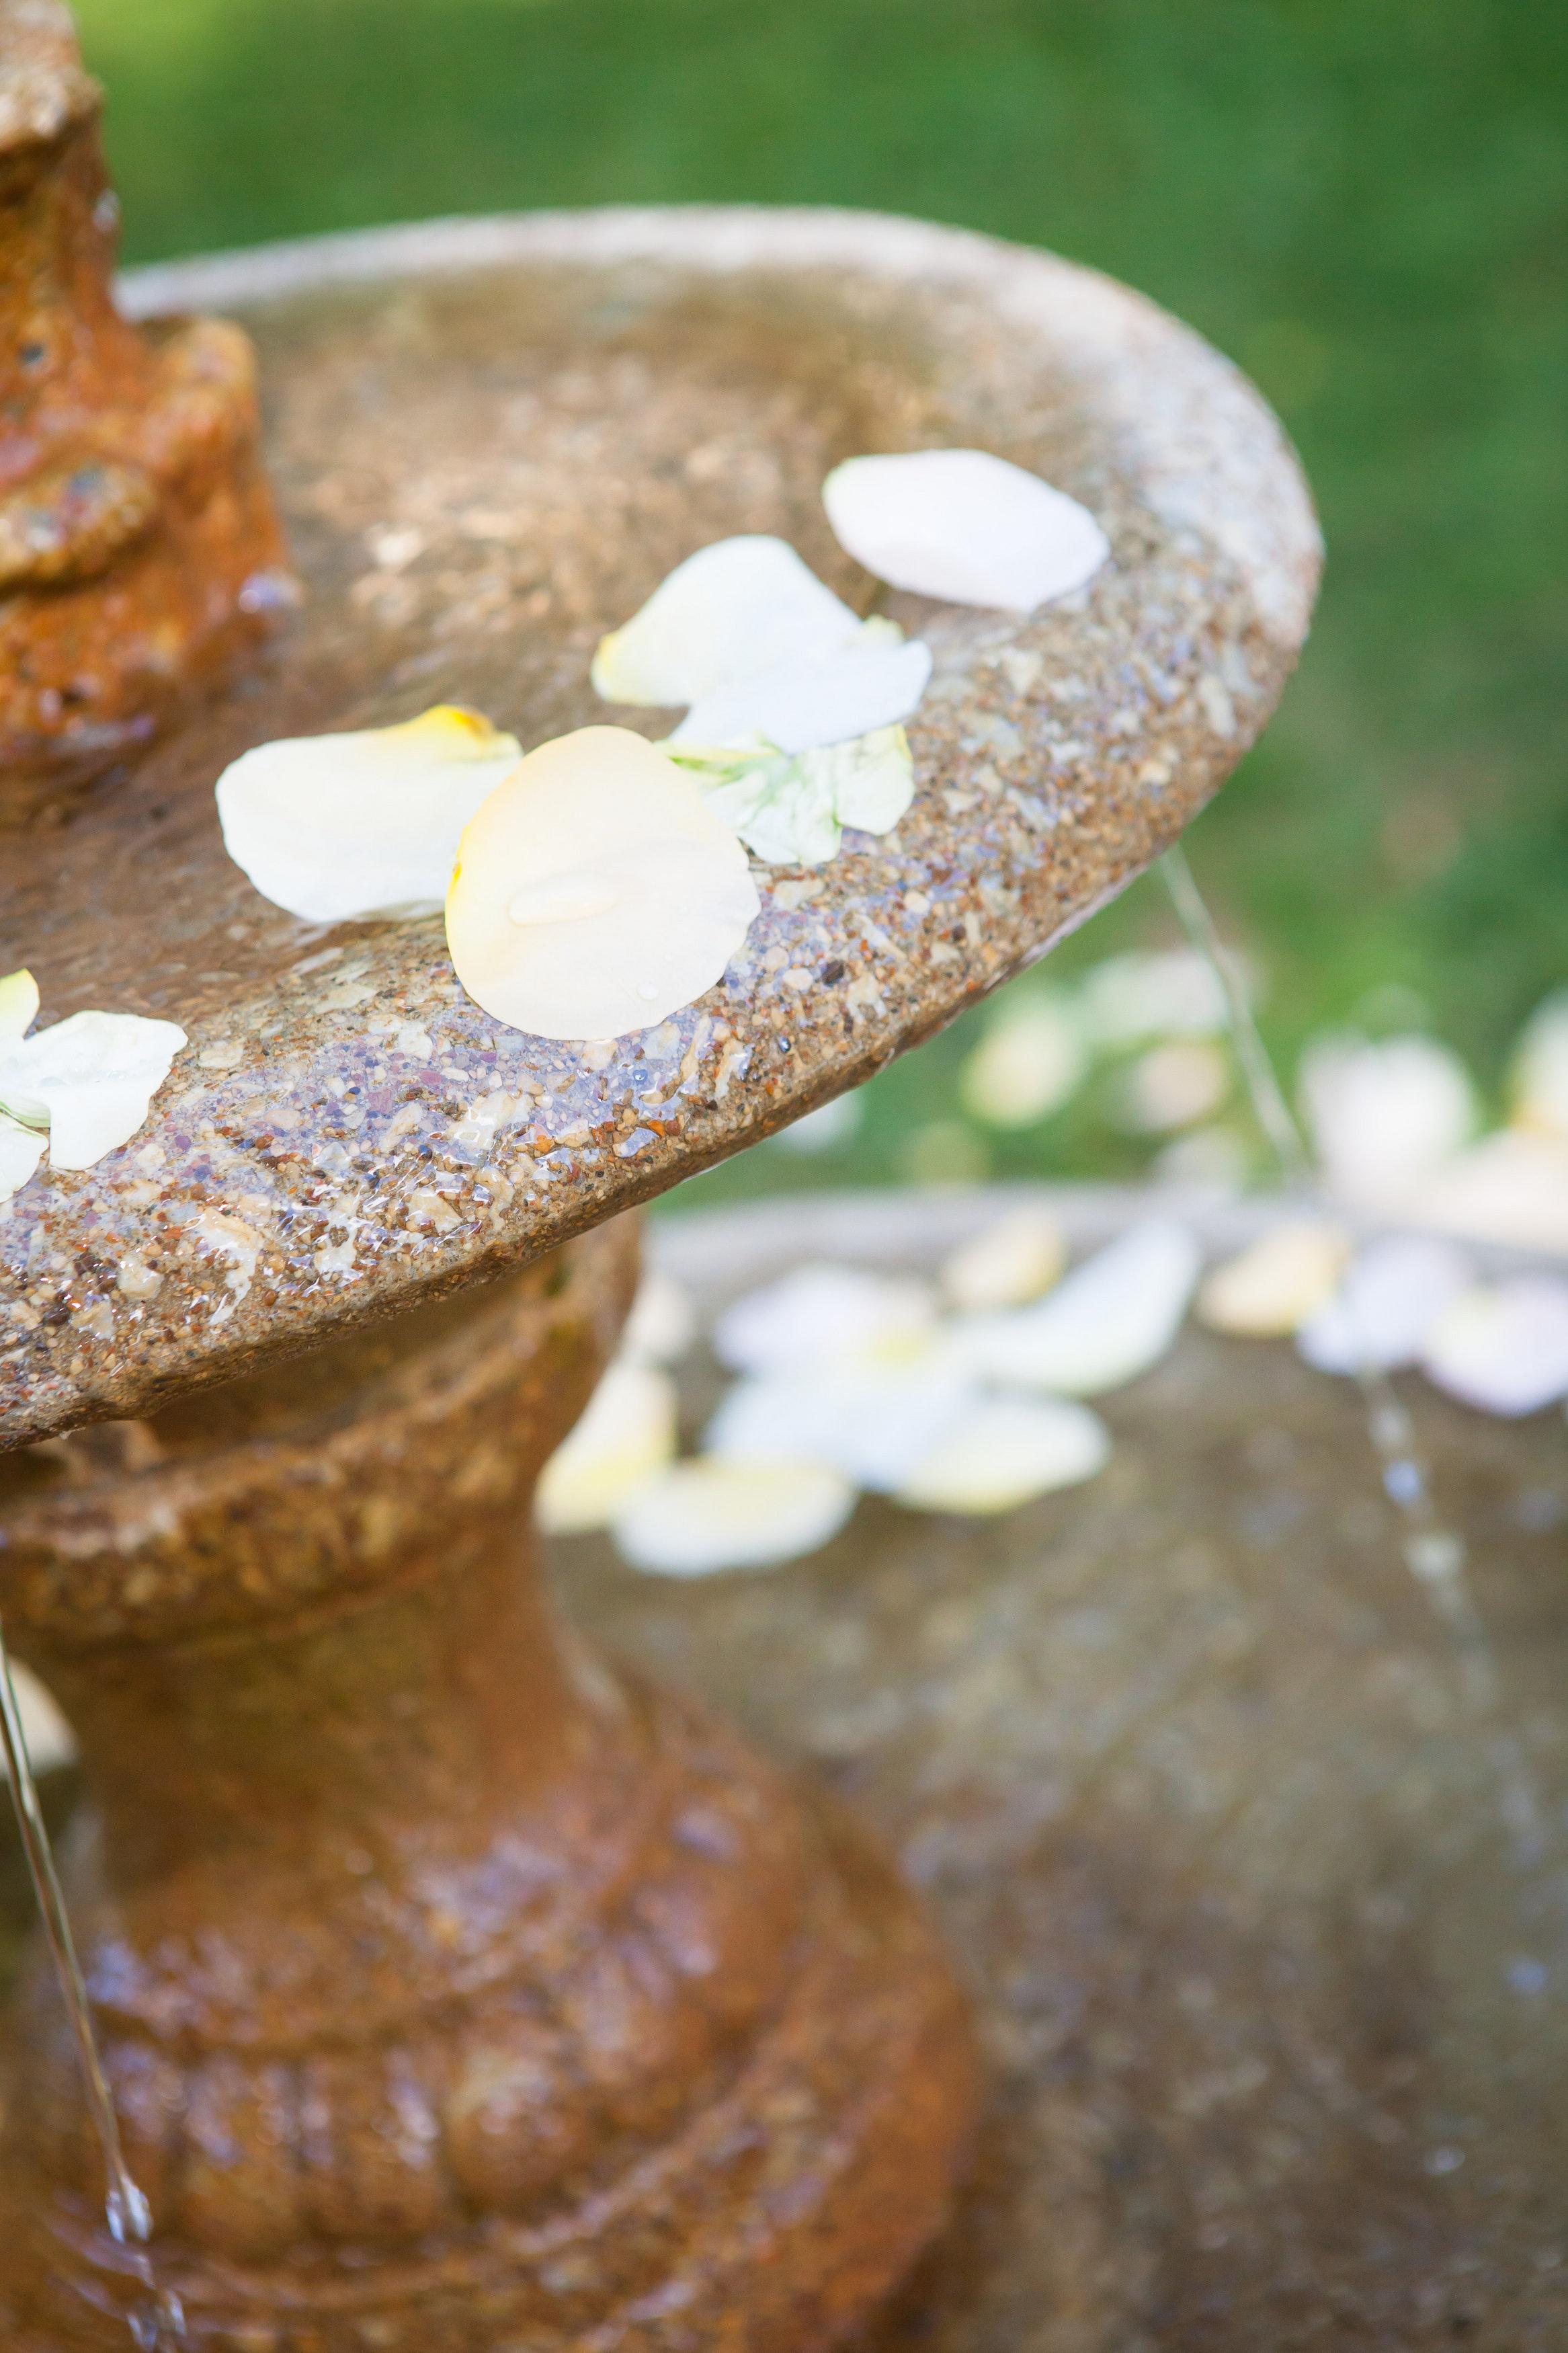 13 Philadelphia Wedding Planner Rose Petal Fountains Outdoor Ceremony.jpg